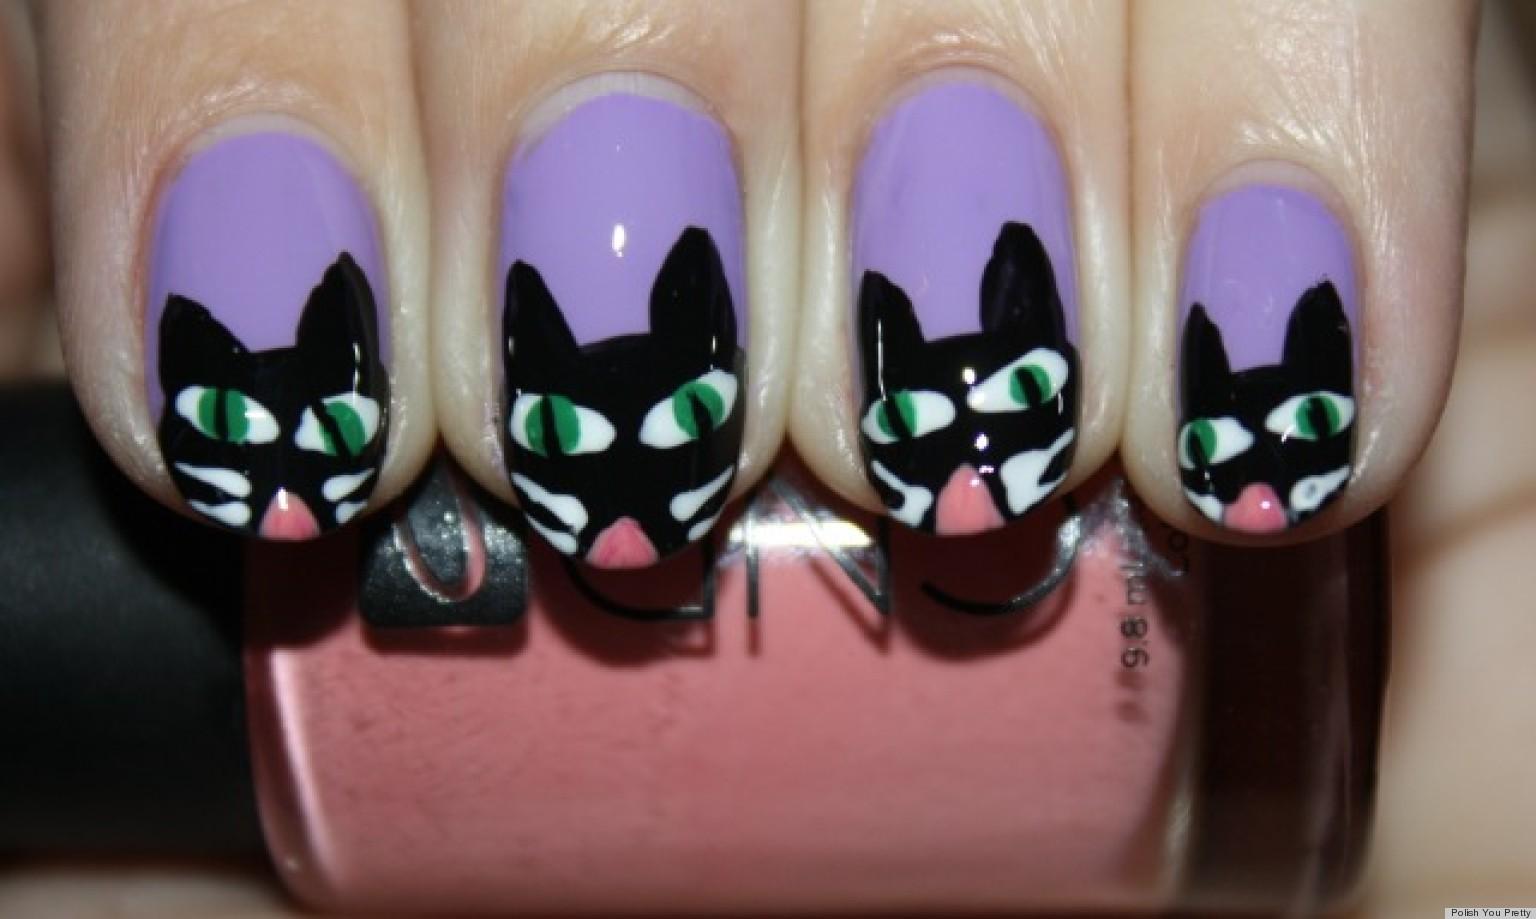 DIY Nail Art: Halloween-Inspired Scaredy Cat Manicure (PHOTO)